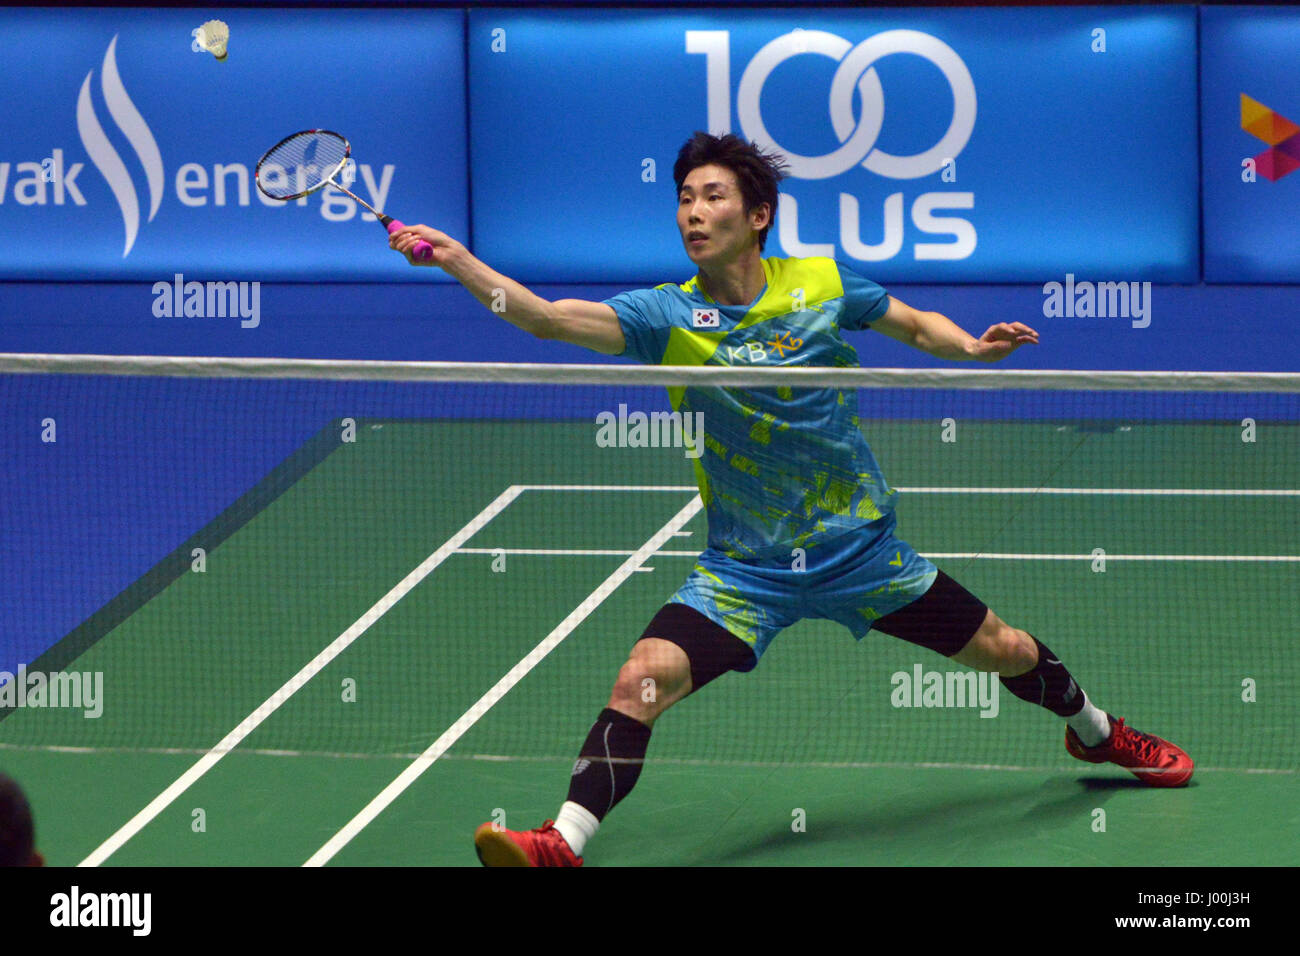 Kuching Malaysia 8th Apr 2017 Son Wan ho of South Korea hits a